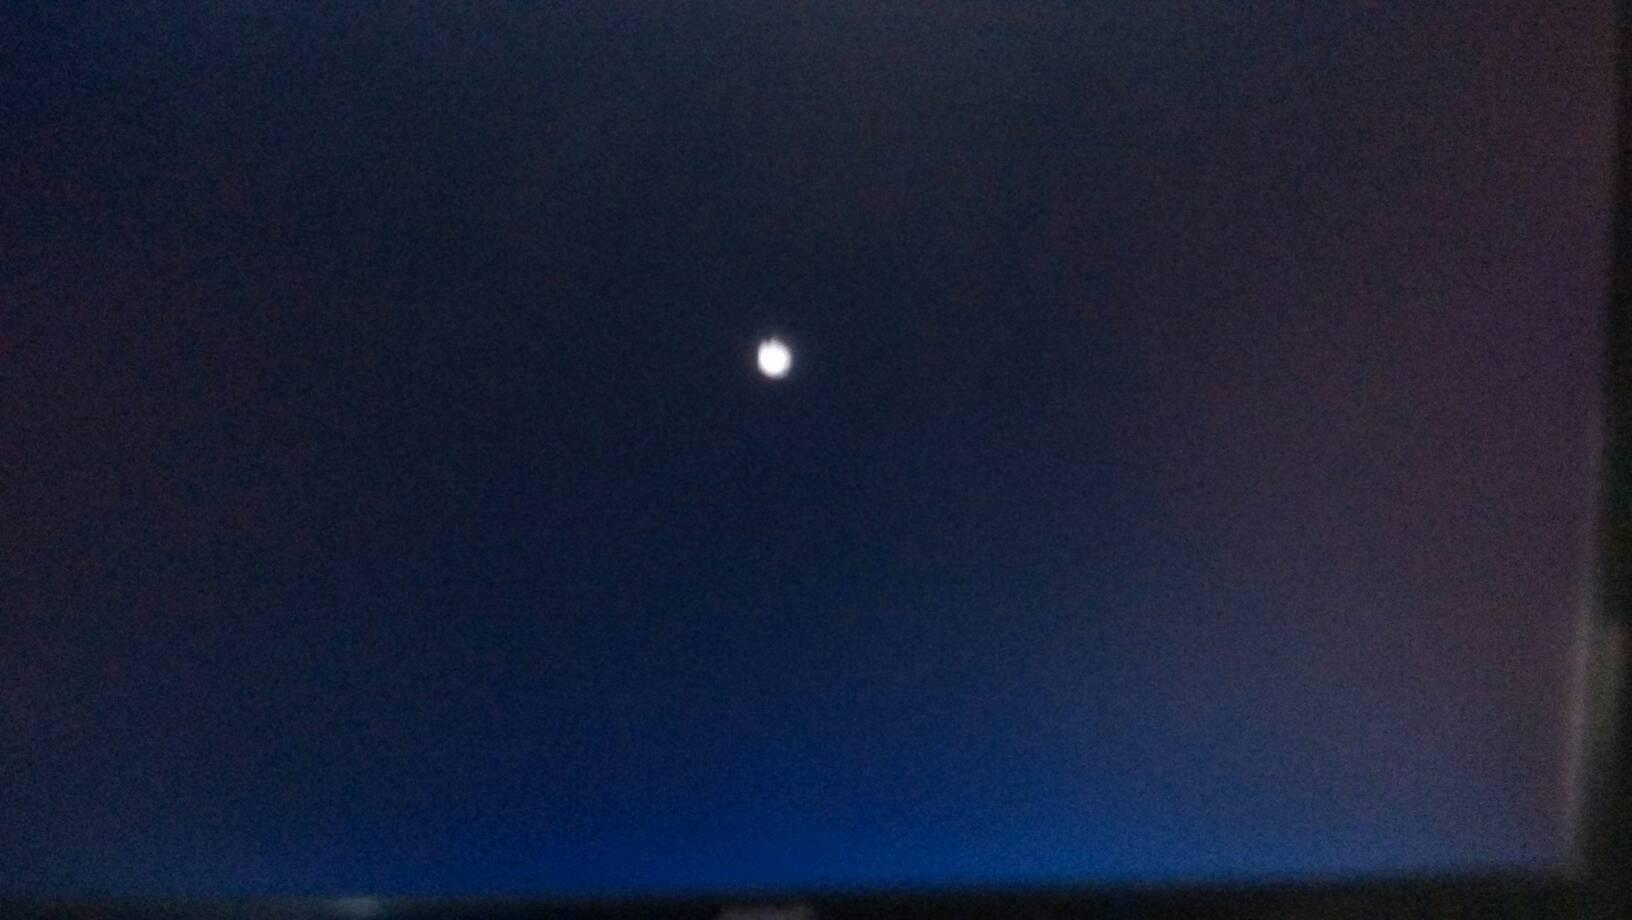 win7开机到这个画面然后就黑屏了,进不了桌面.图片